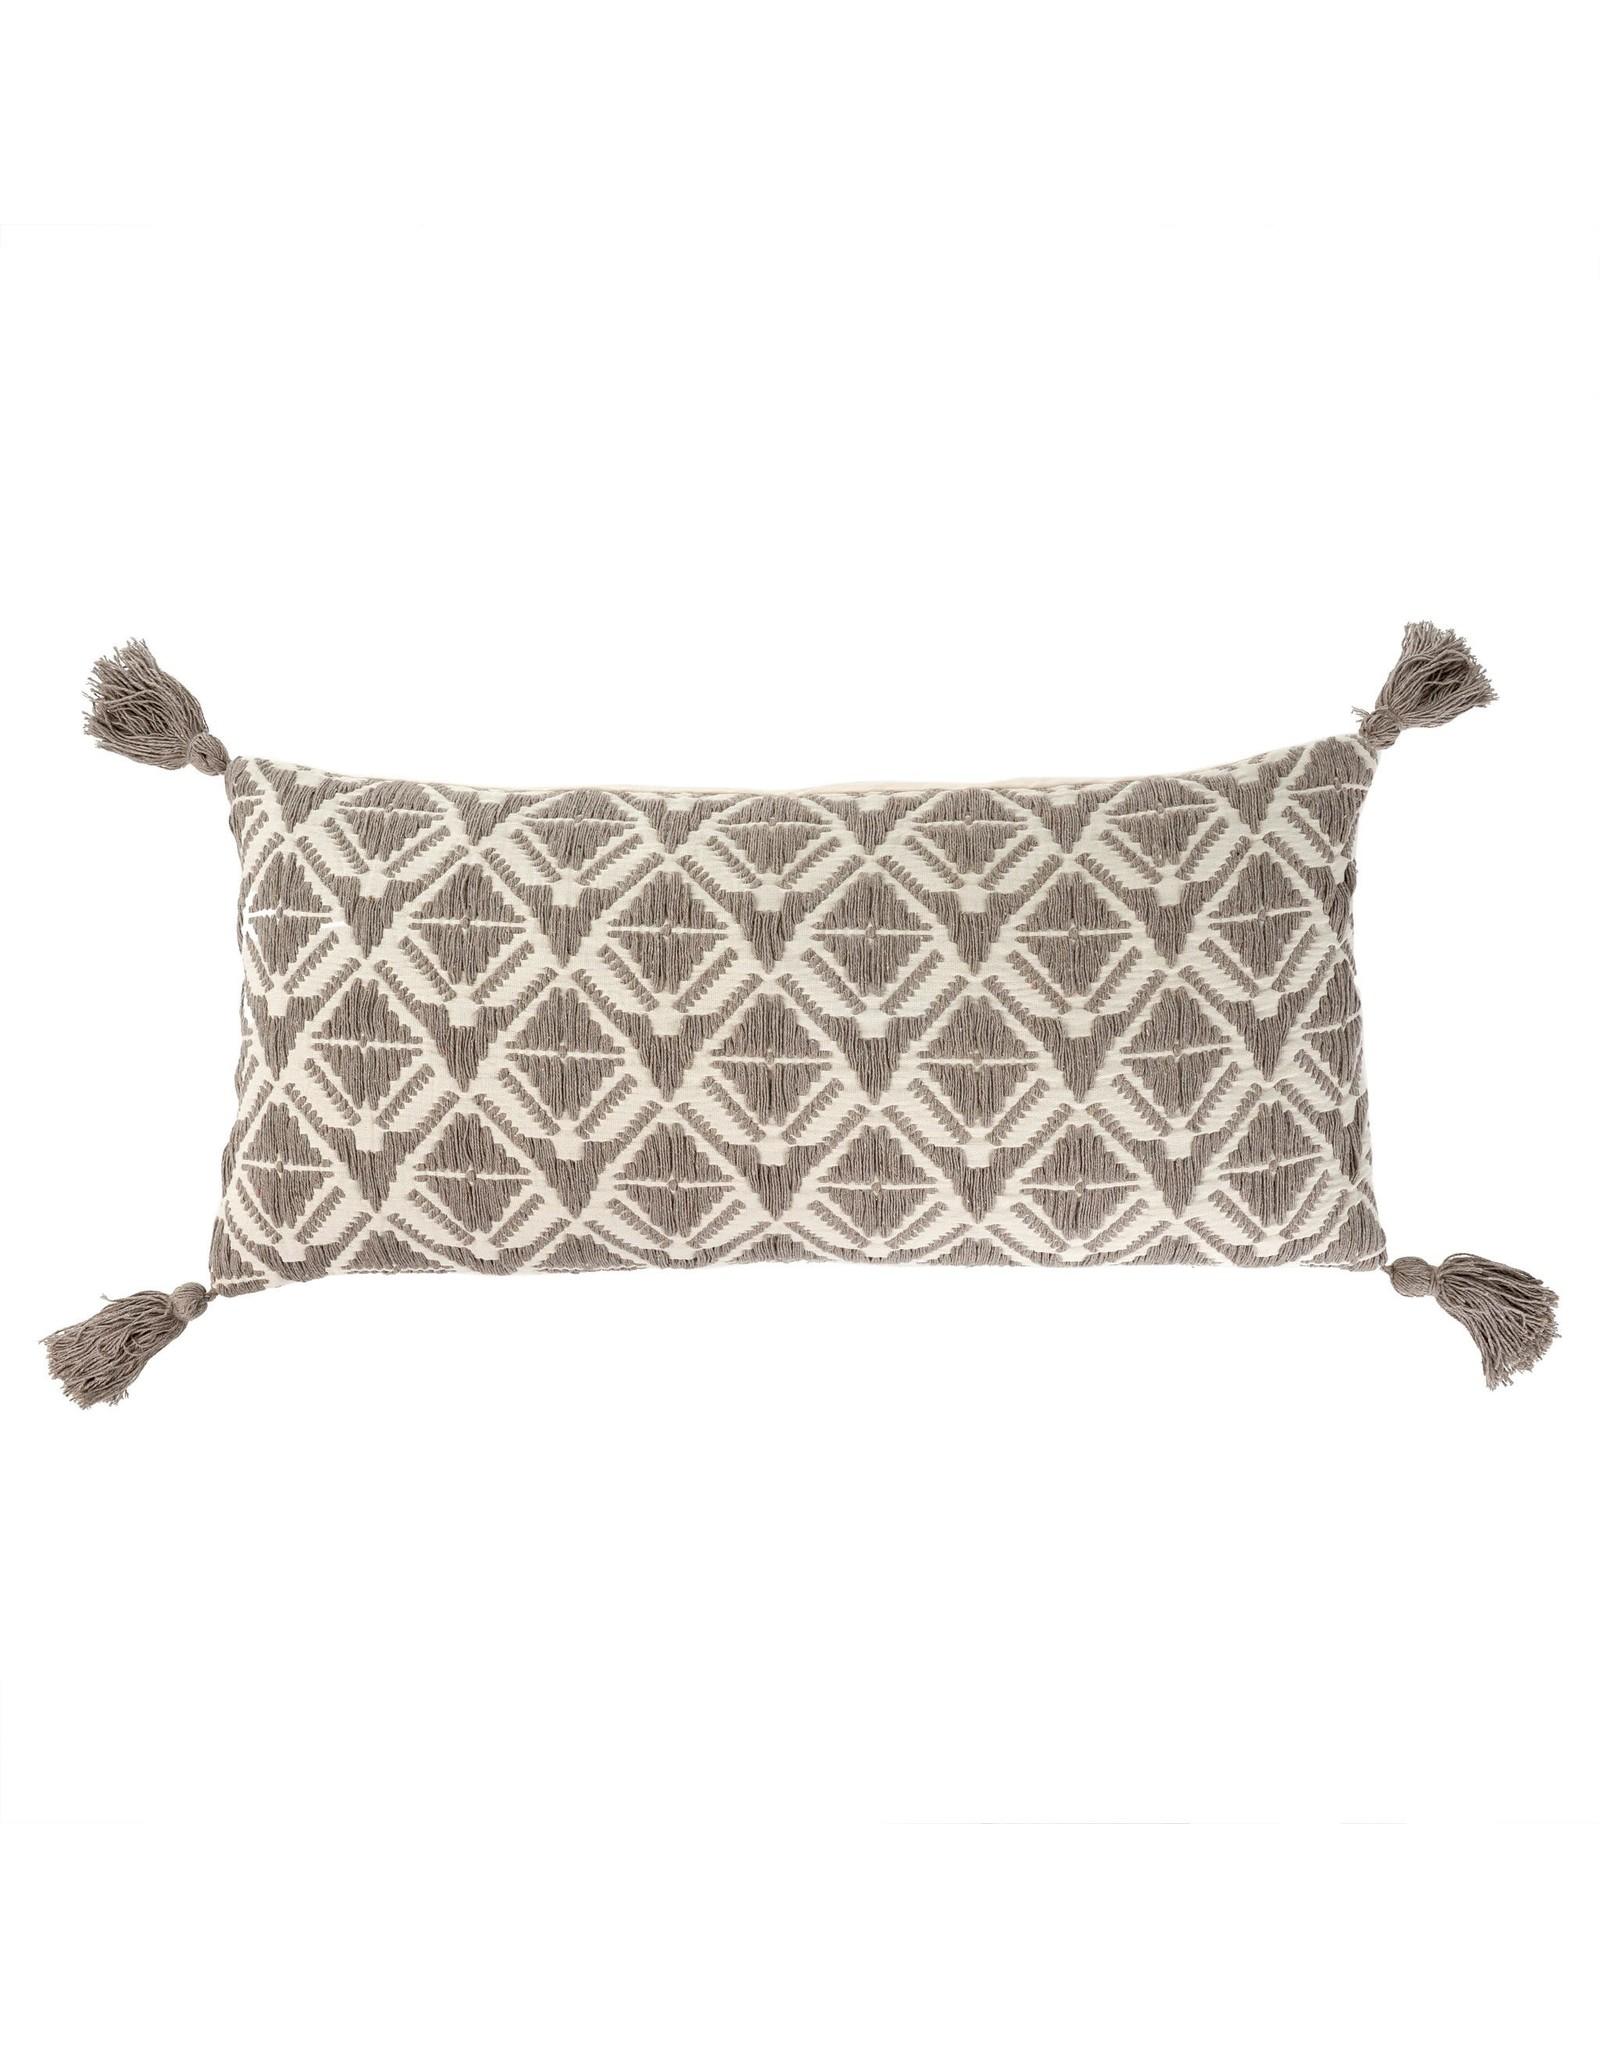 15x32 Stella Bolster Pillow, Stone